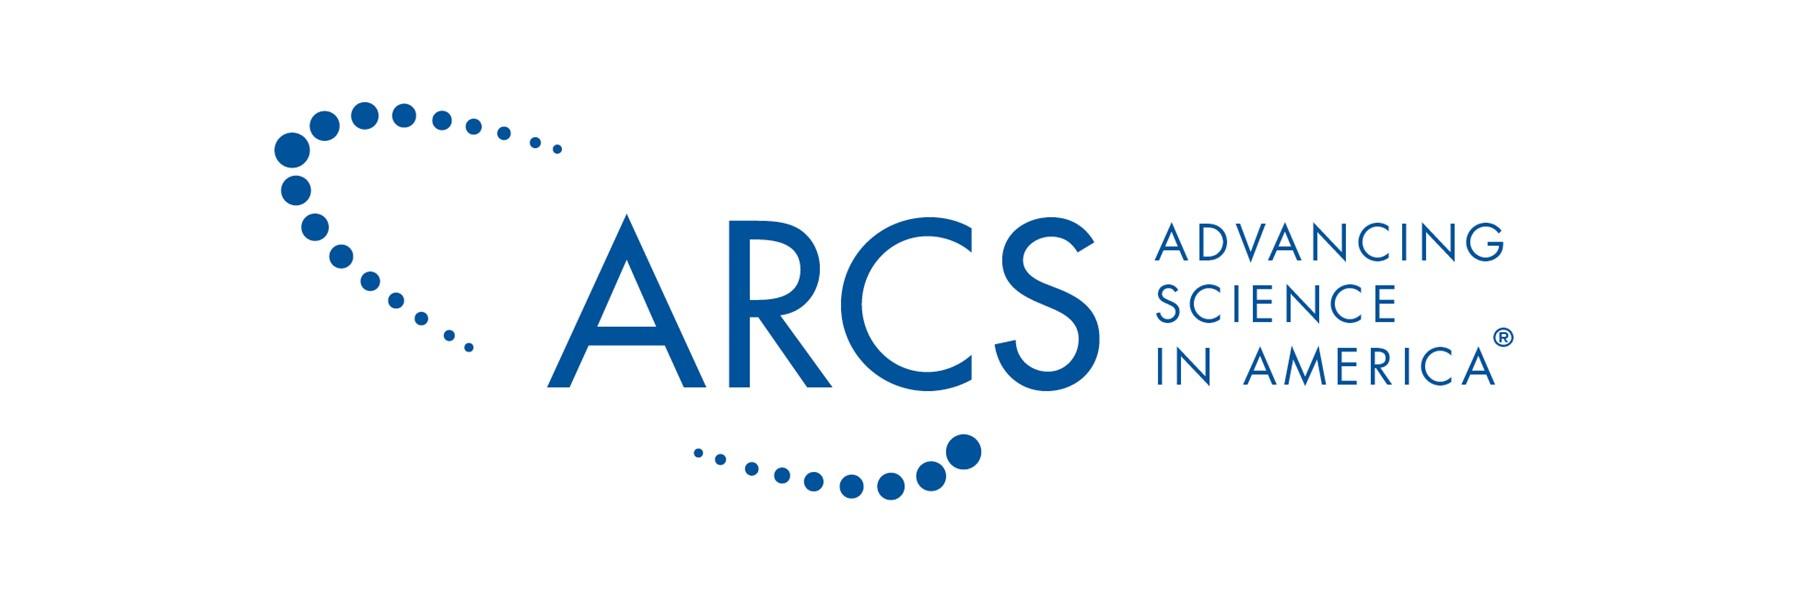 UH Mānoa Scholars Awarded ARCS Foundation Grants For Research